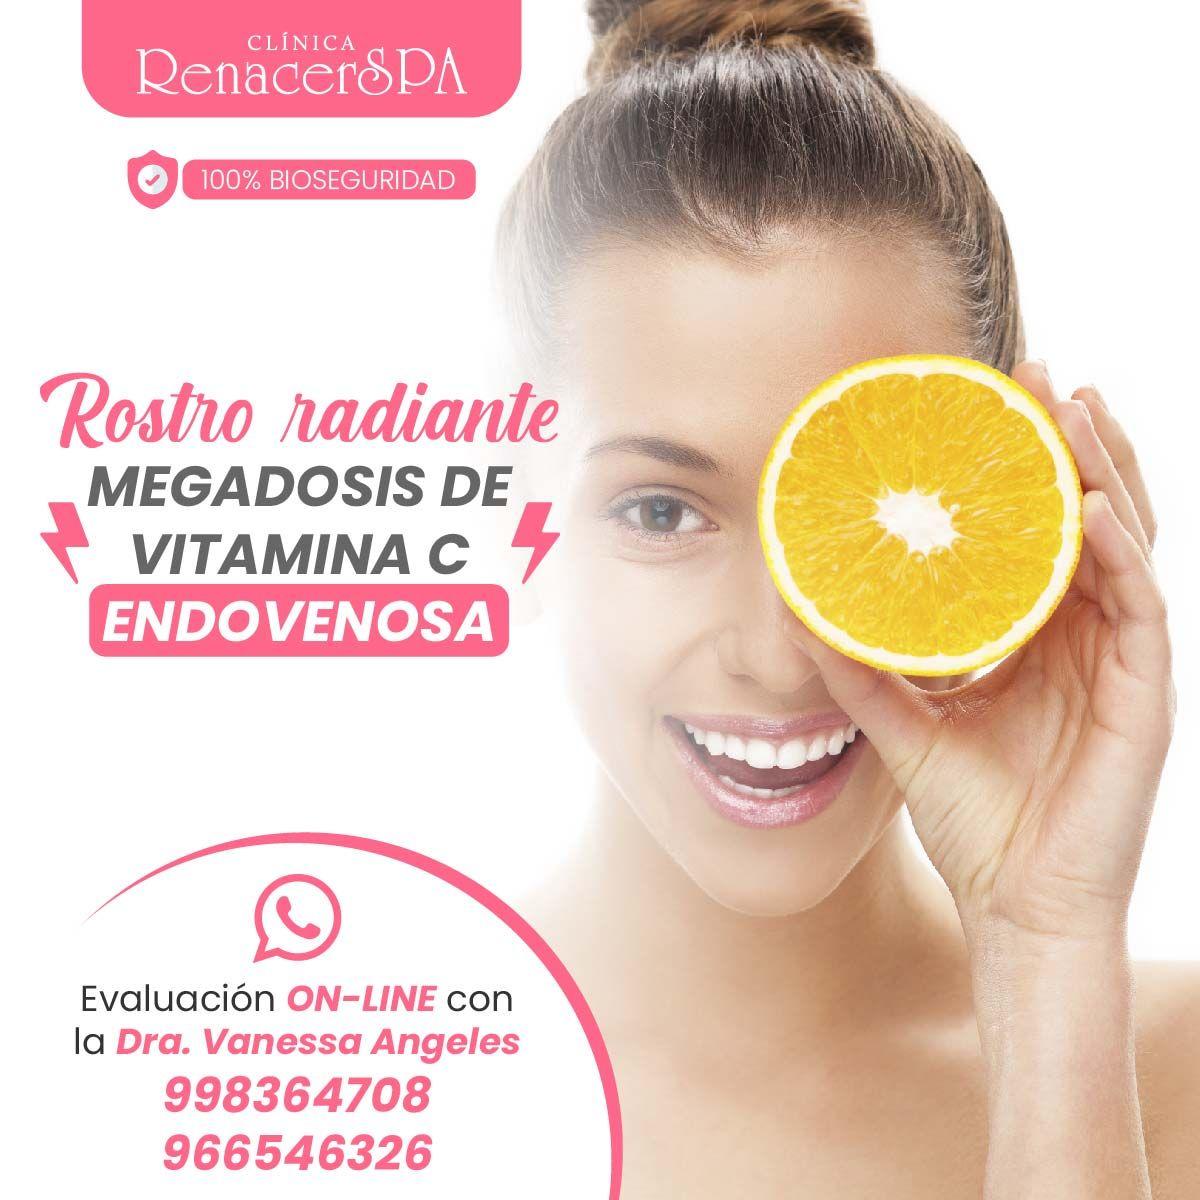 Megadosis De Vitamina C Intravenosa Facebook Sign Up Prevention Grapefruit